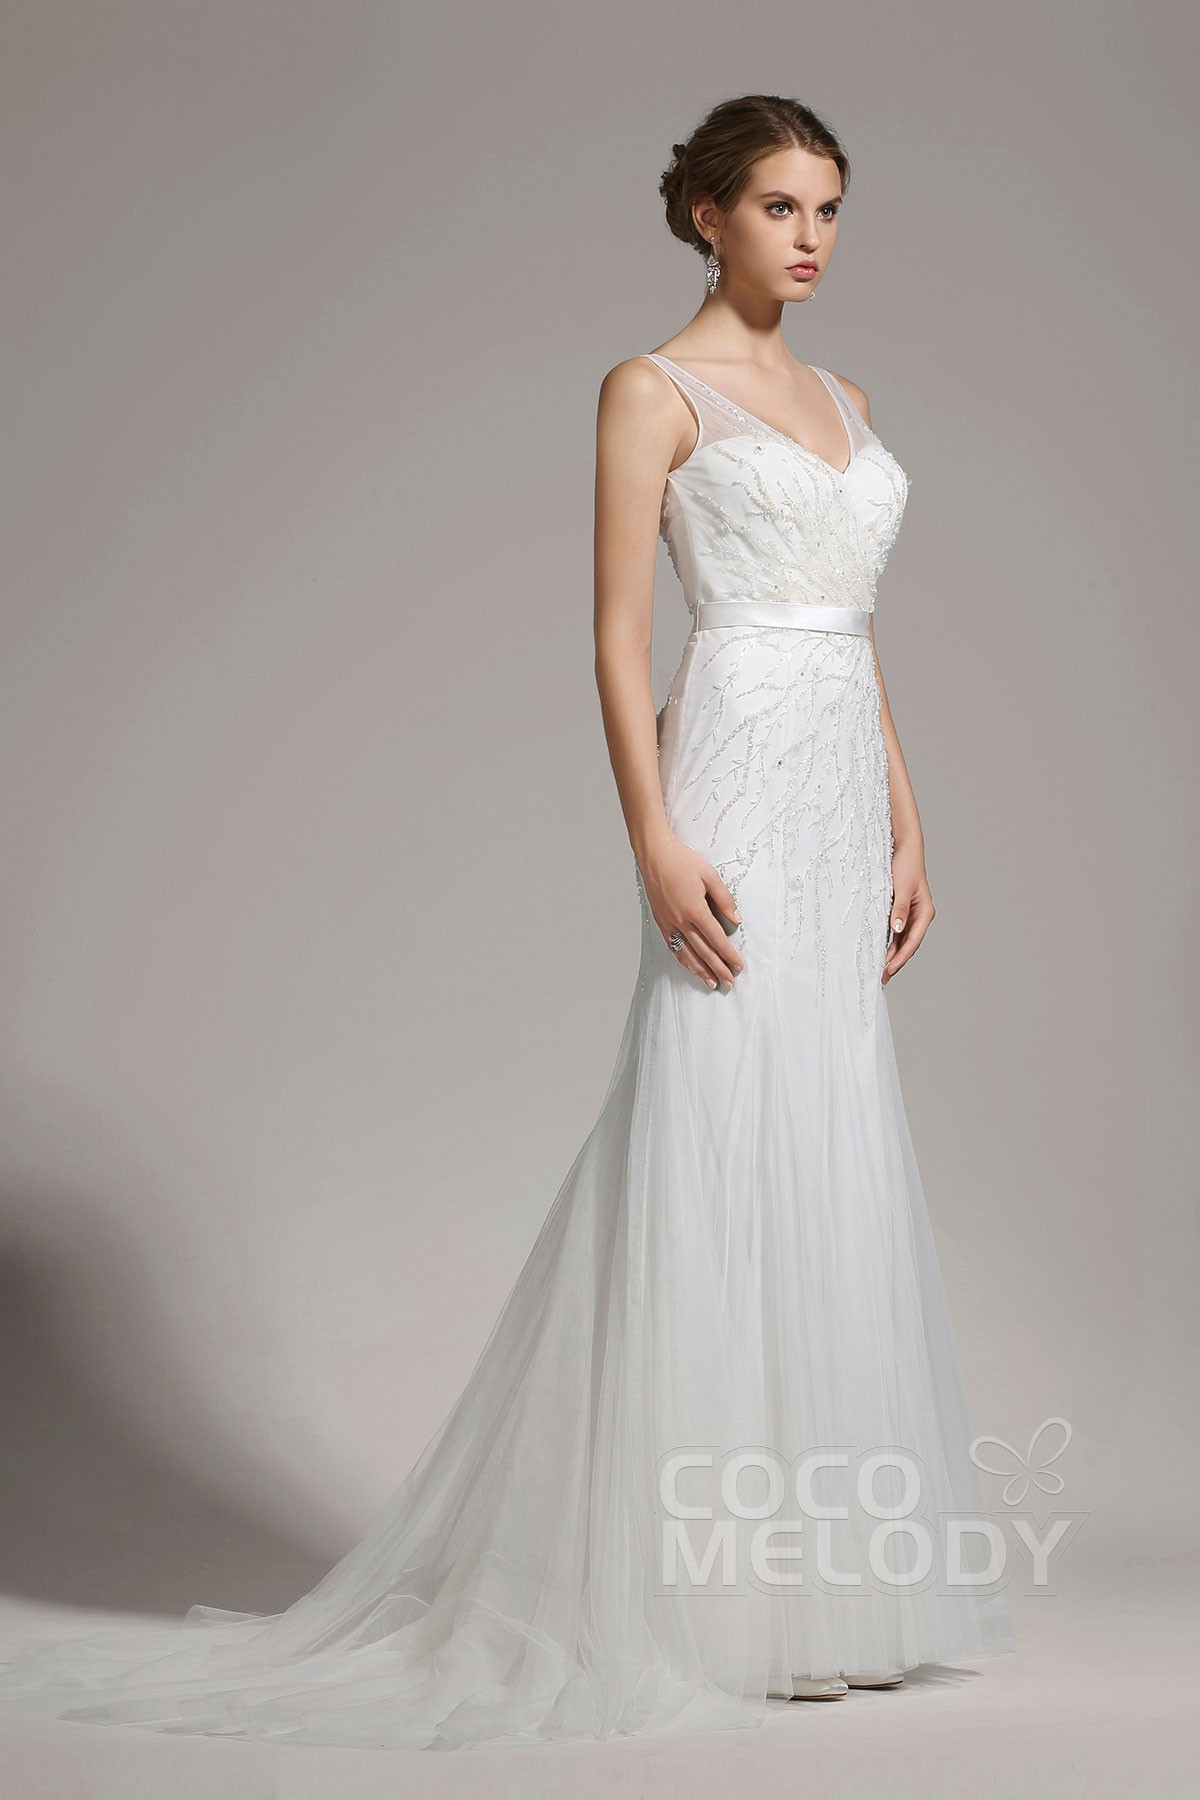 Sheath Column Tulle Sleeveless Wedding Dress Awzt15002 Cocomelody